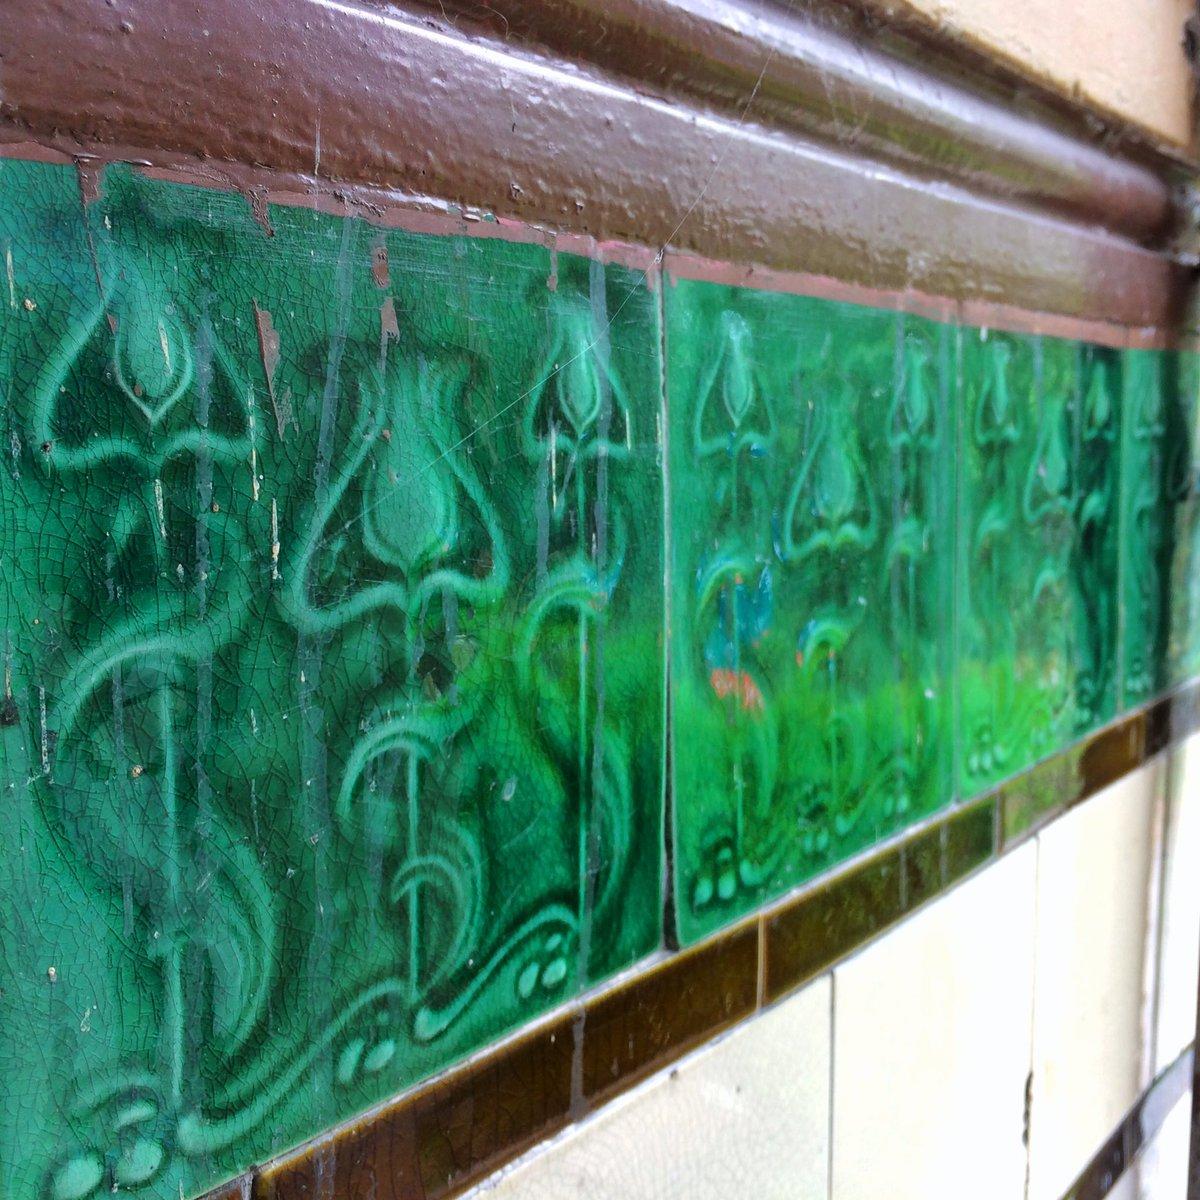 #maryhill, #westend of #Glasgow, #scotland  #tenementtiles #tiletuesday #tiles #floral #green #blue #Scottish #tiledesign #tilecrush #ceramictile #tileporn #ihavethisthingwithtiles #archives #architecture #tenementpic.twitter.com/gnD2T6rPlo